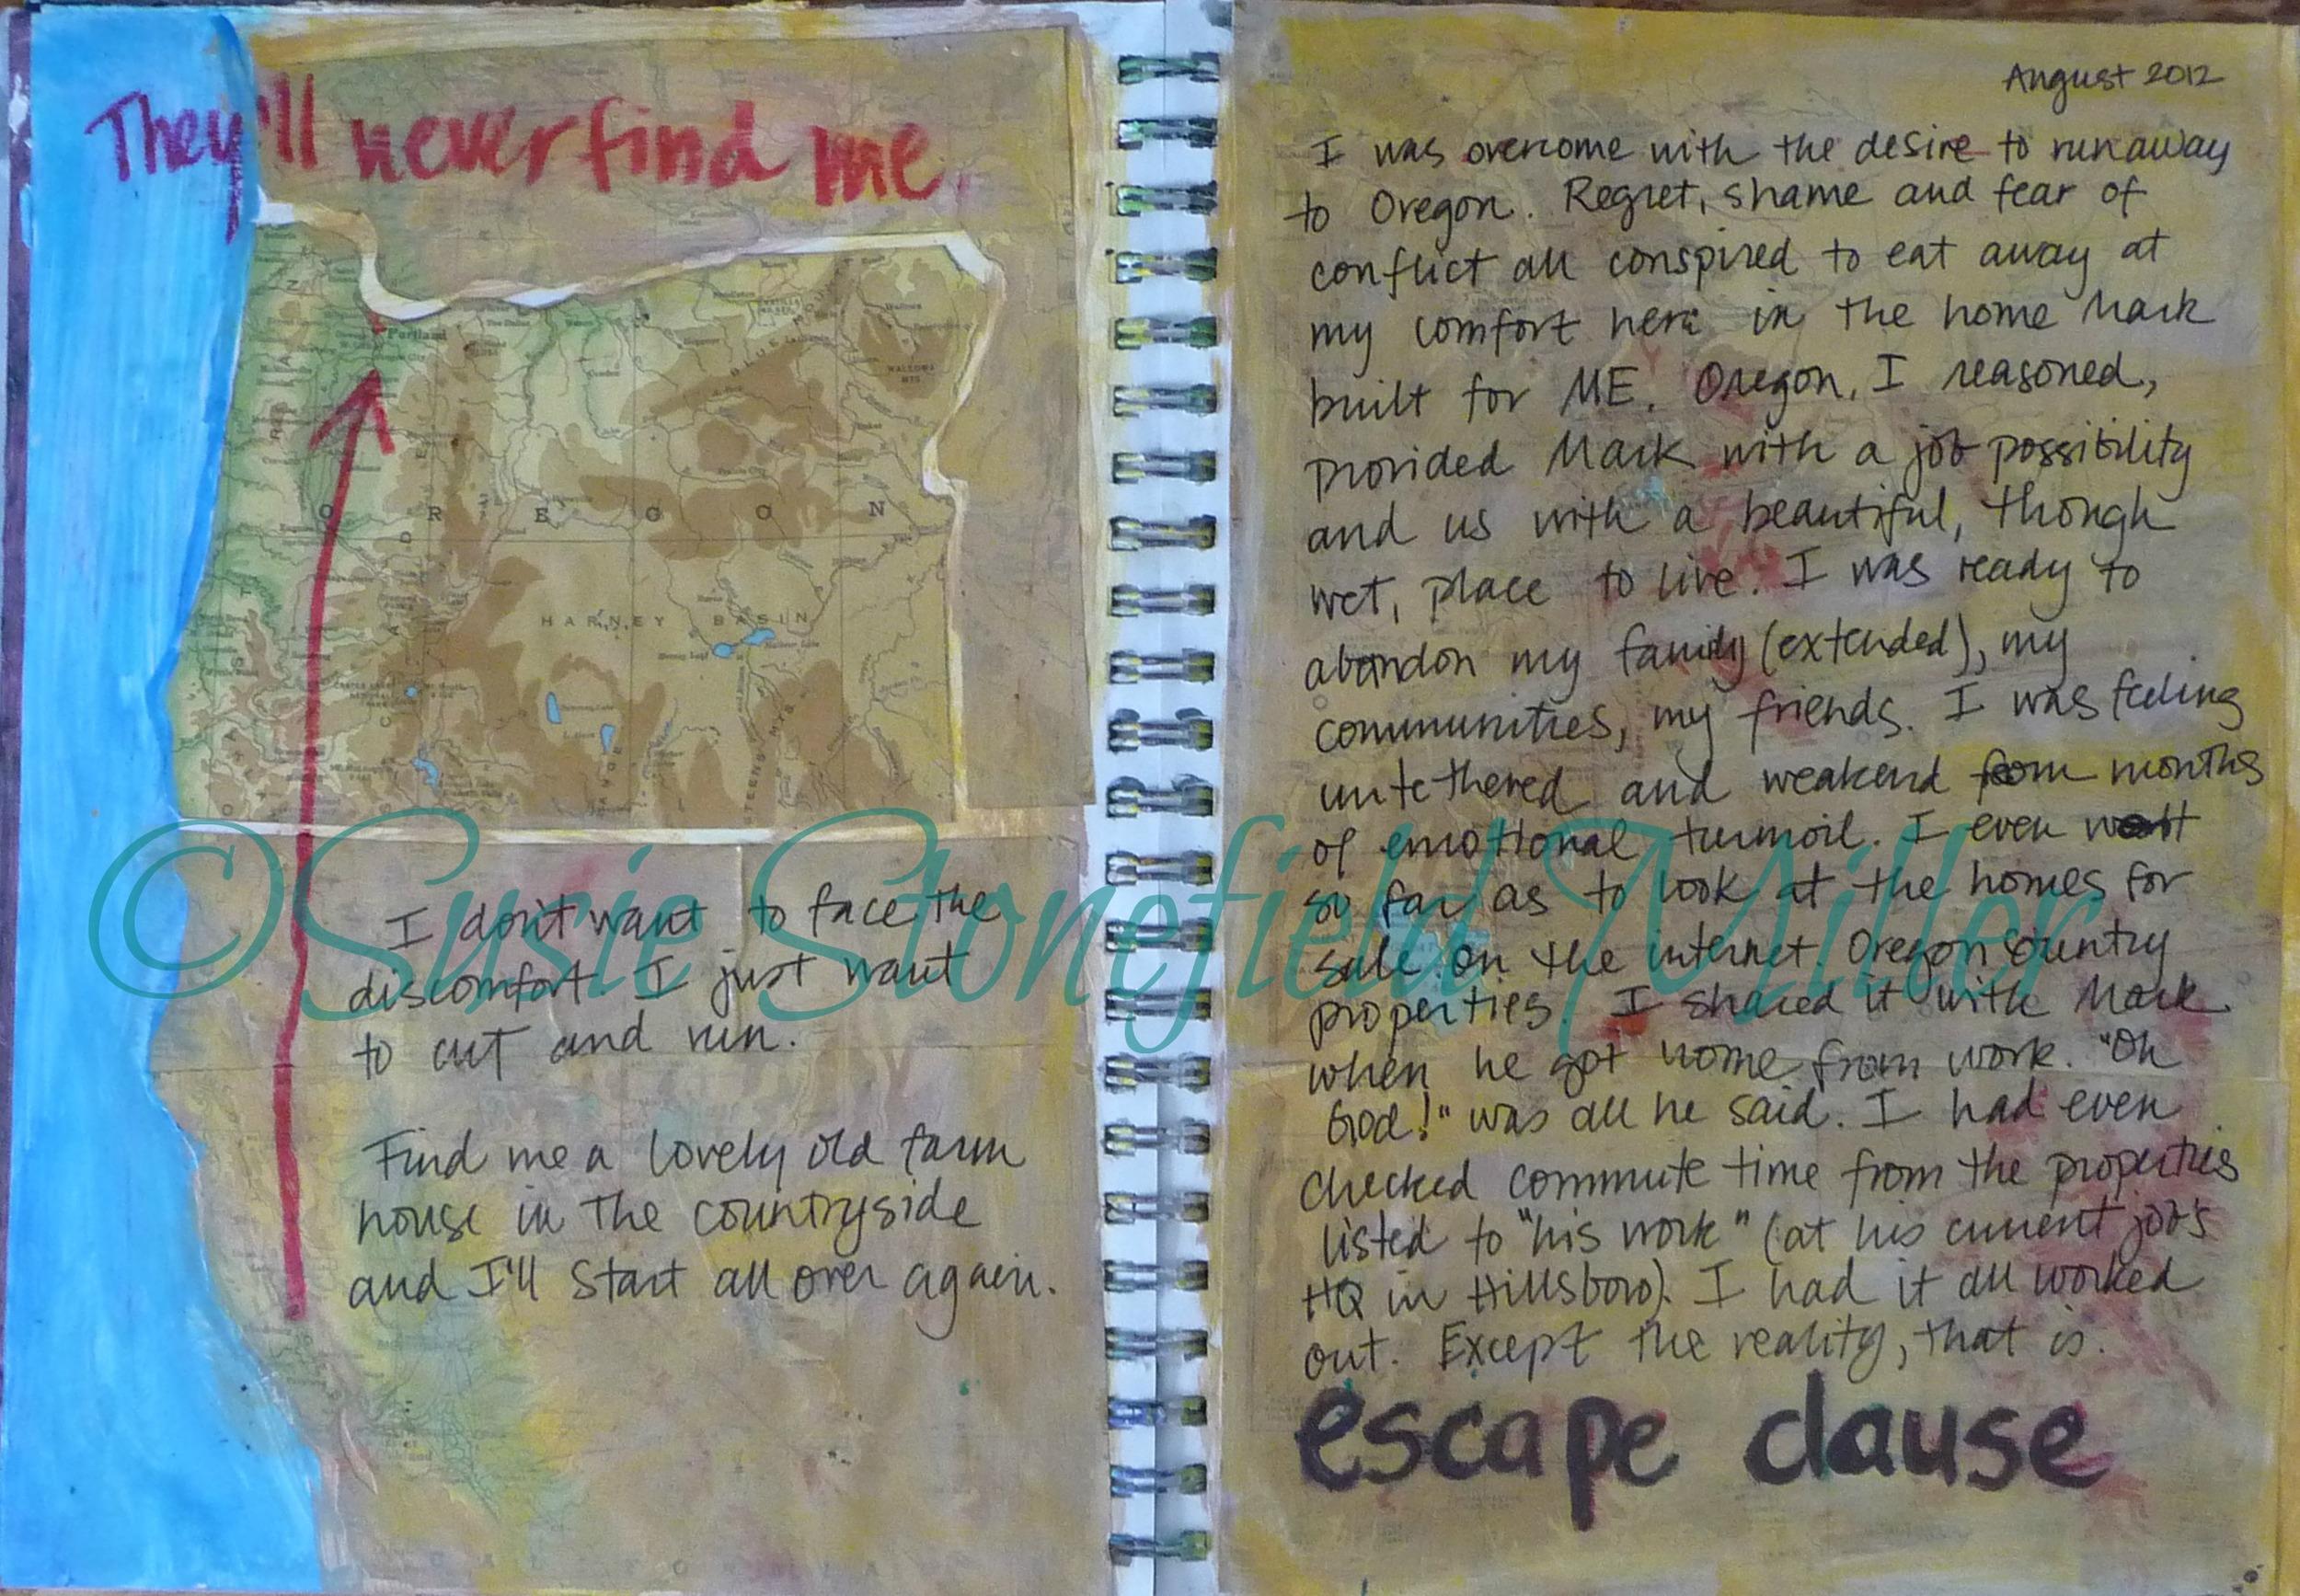 escapeclause wm.jpg